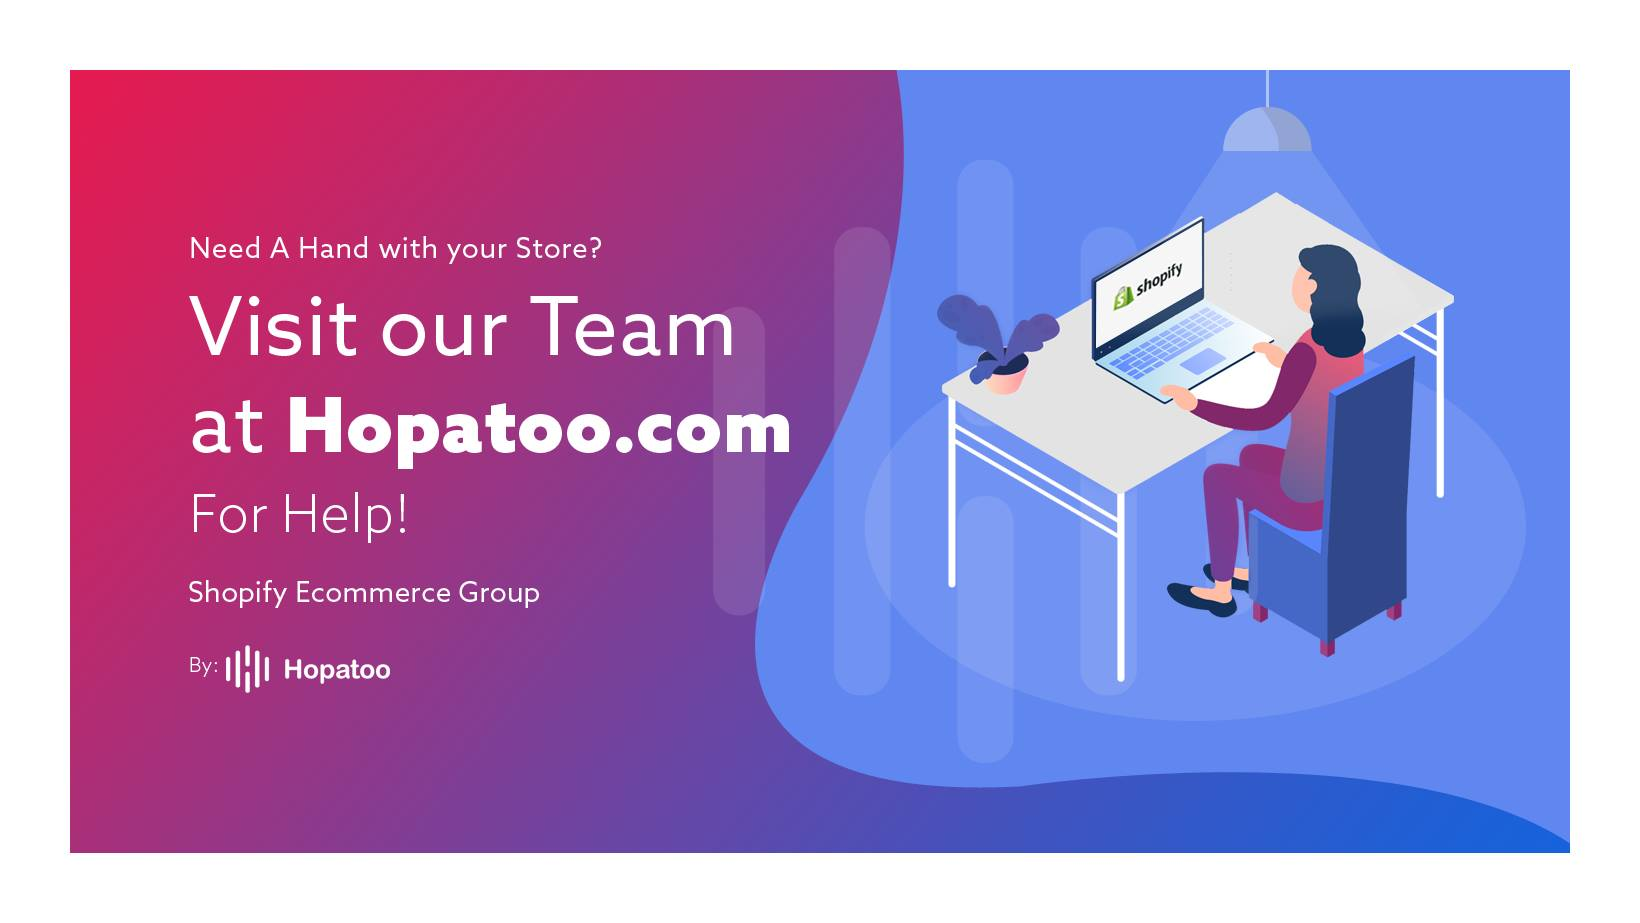 Shopify Ecommerce Group- eCommerce Facebook Groups 2021